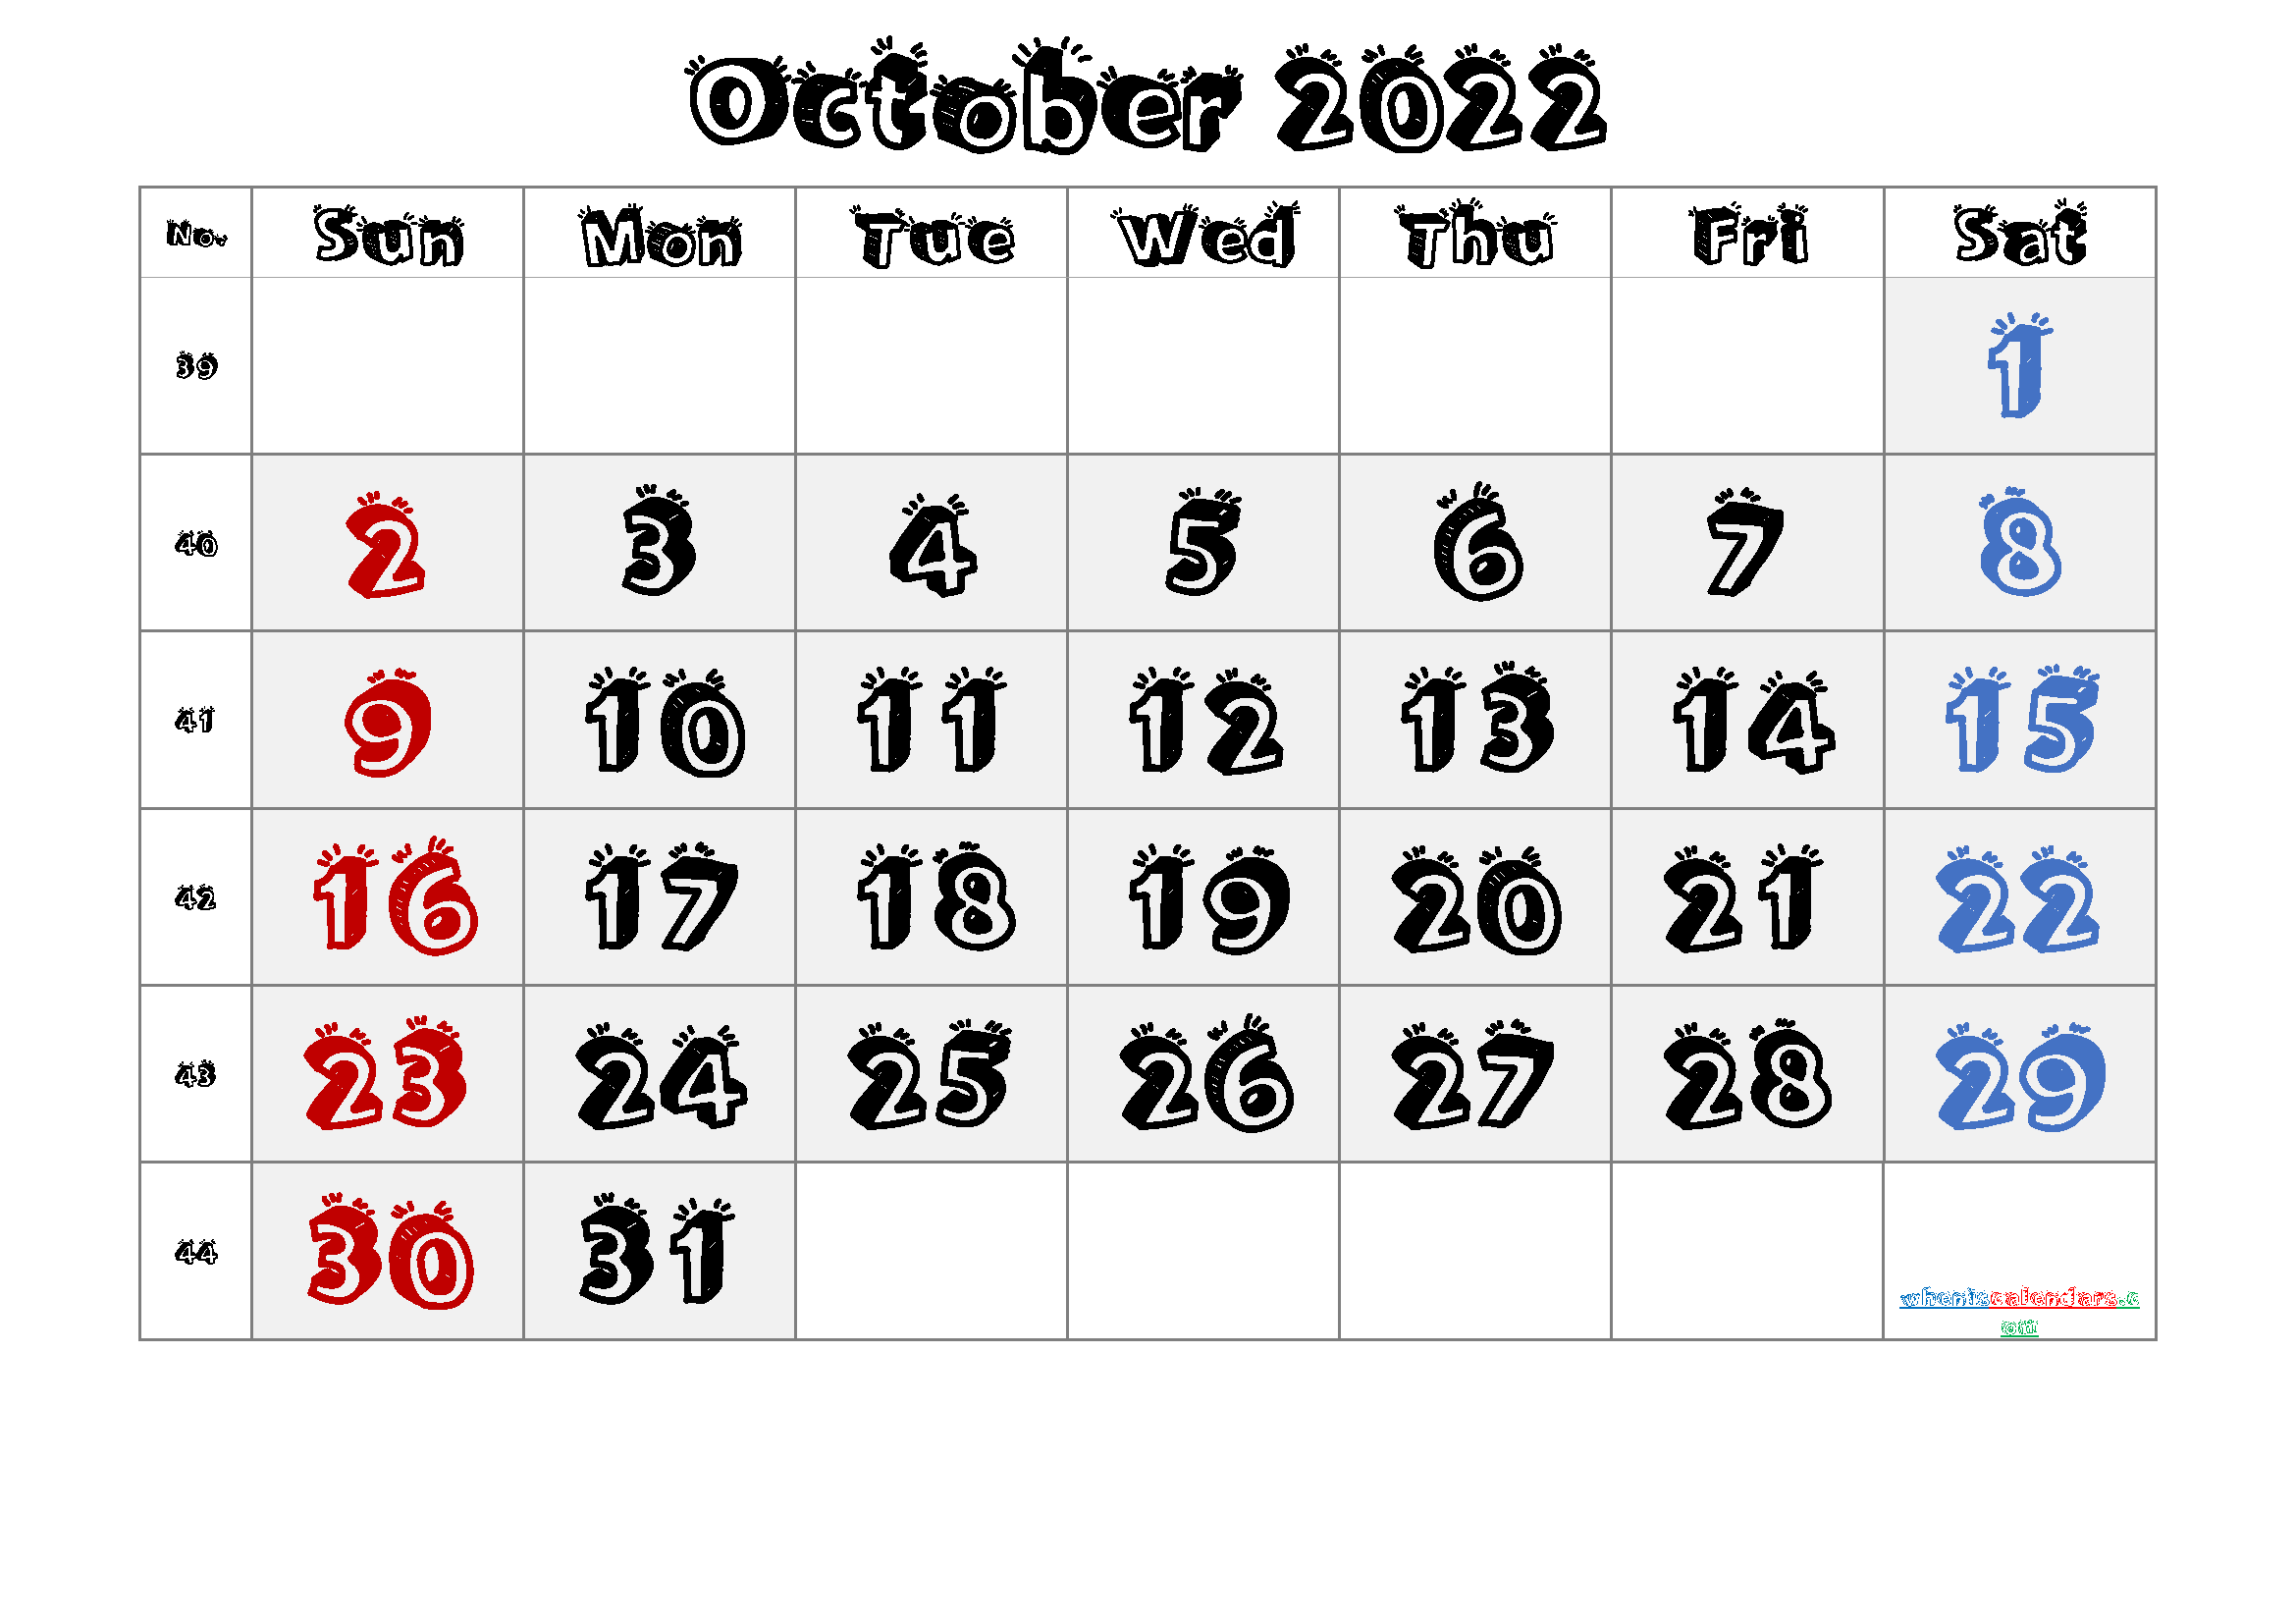 2022 October Free Printable Calendar